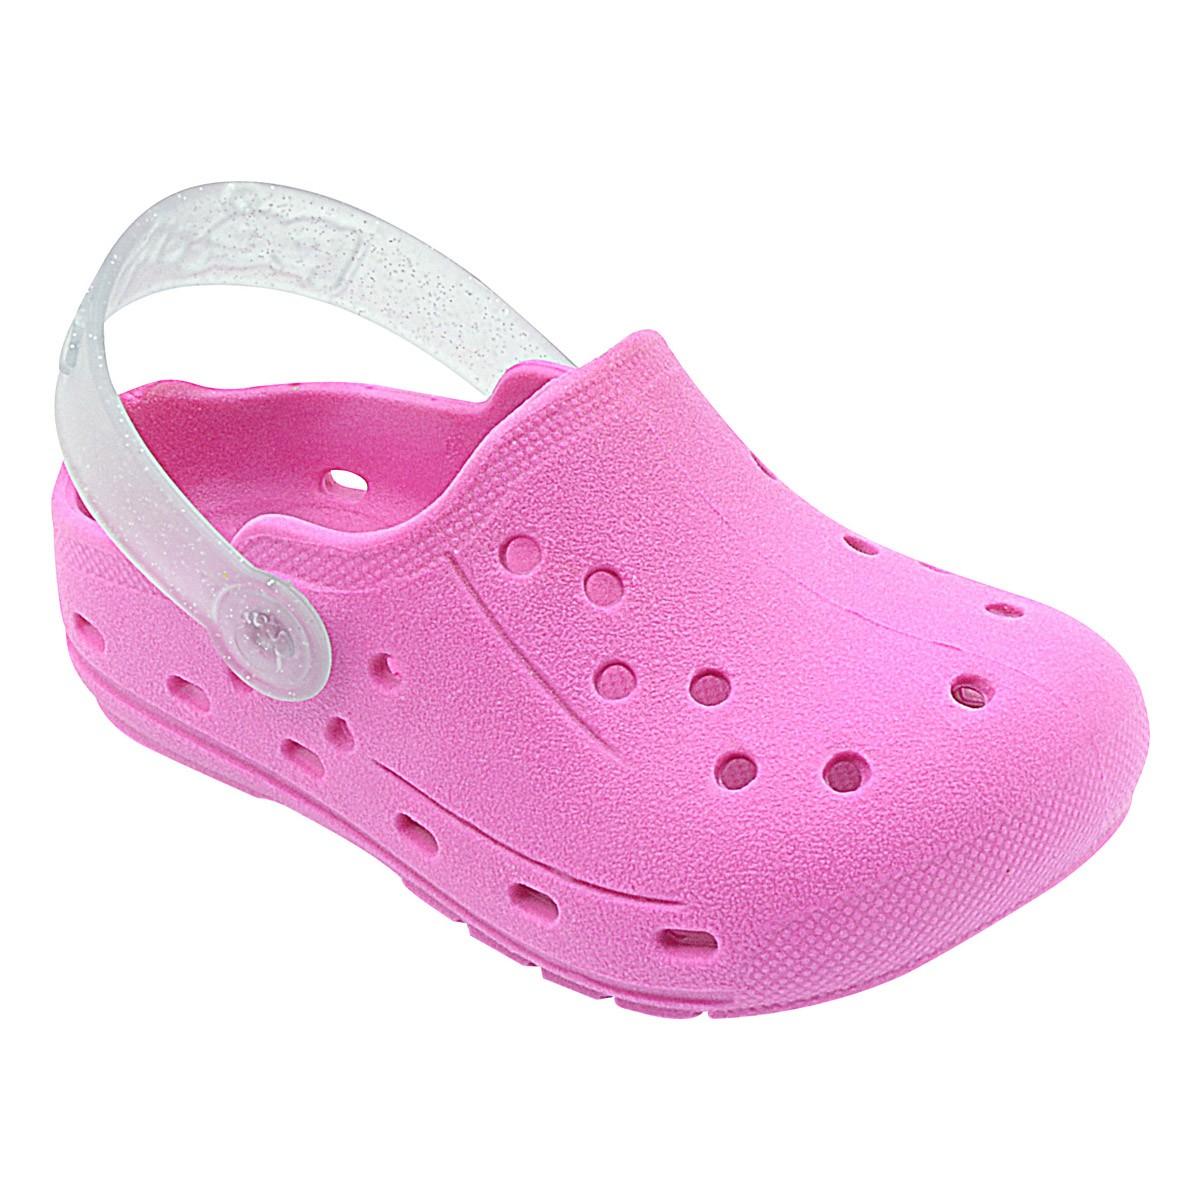 Babuche Infantil Pink com Glitter Menina